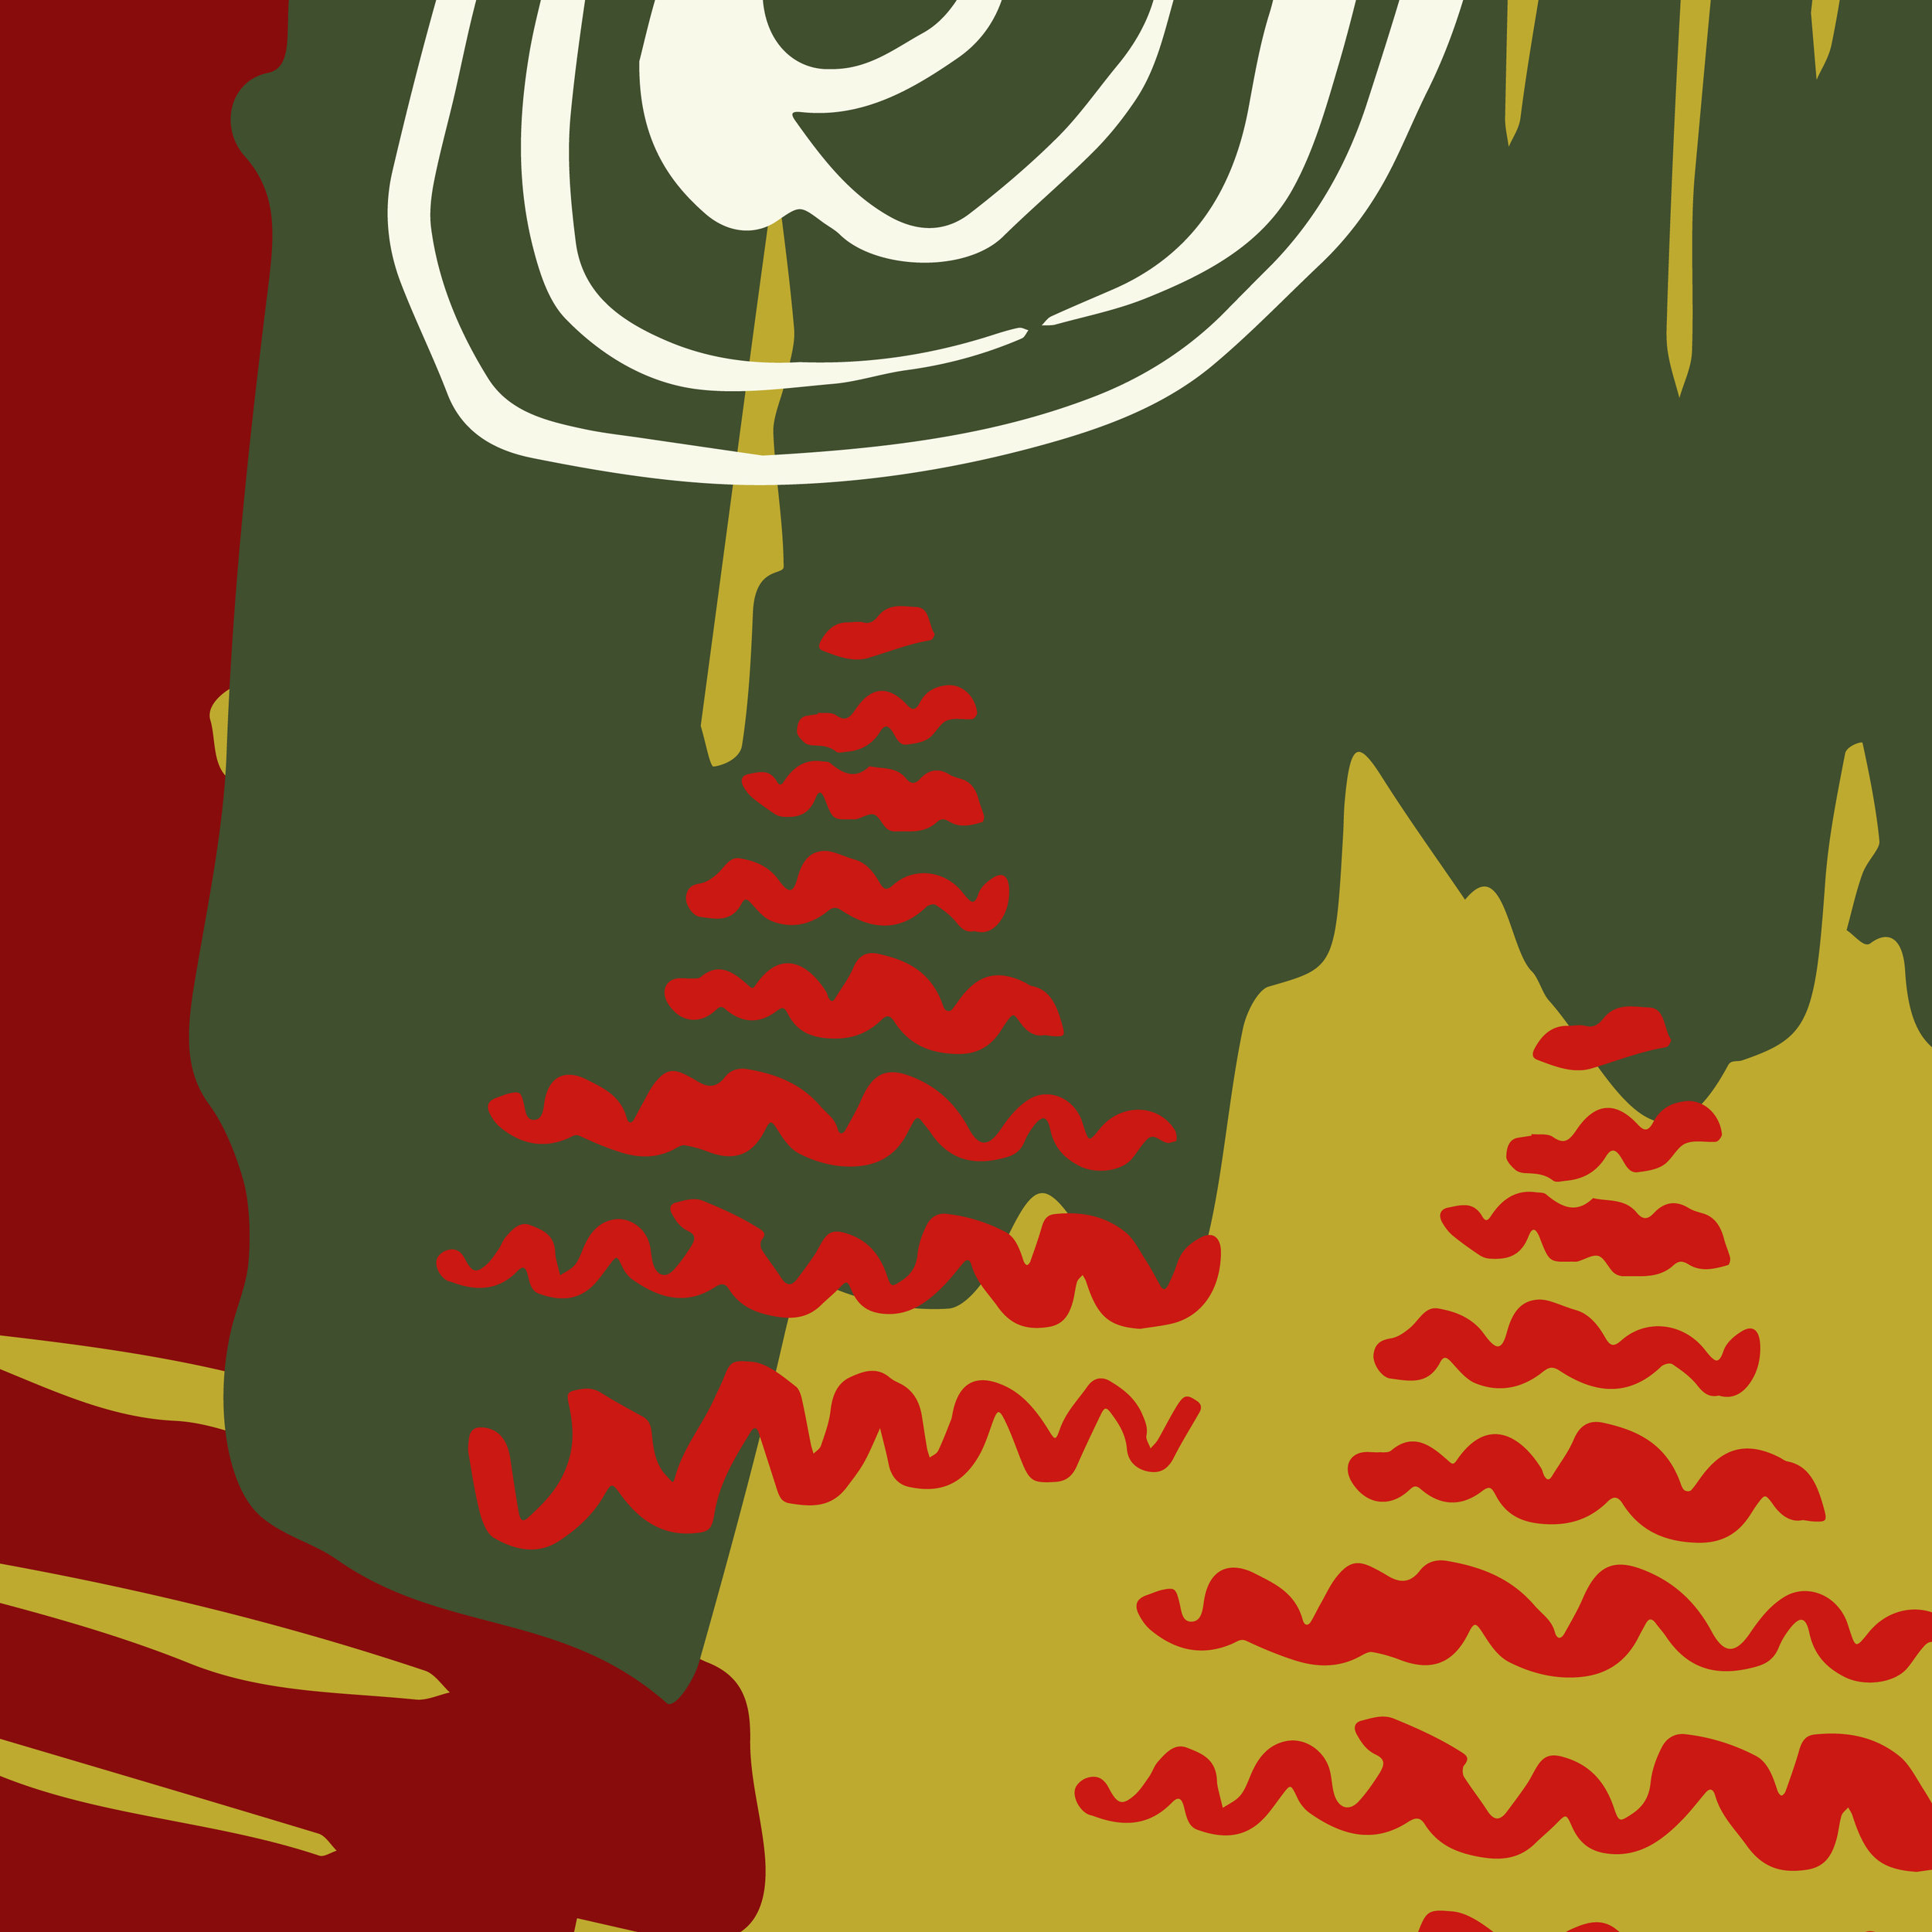 artboardHoliday3-01.jpg